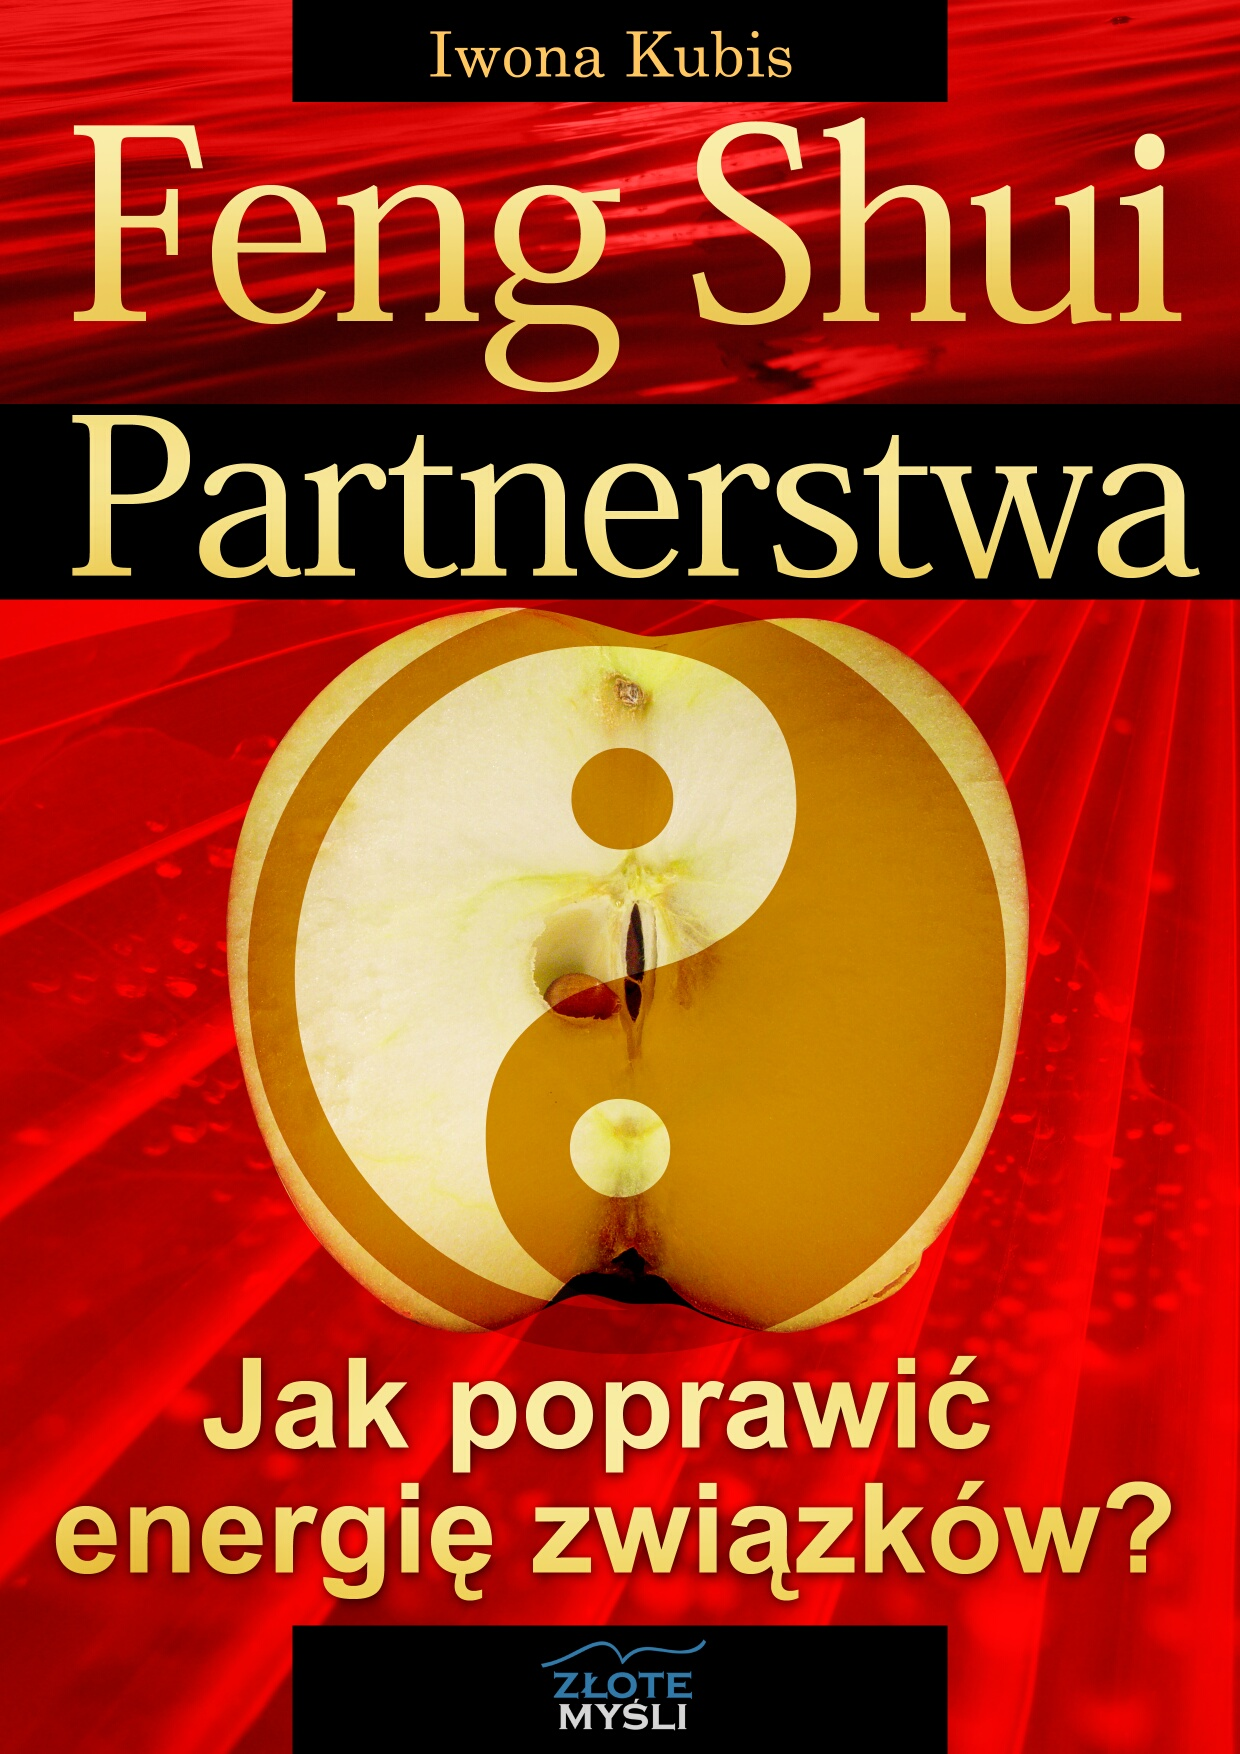 Iwona Kubis: Feng shui partnerstwa - okładka